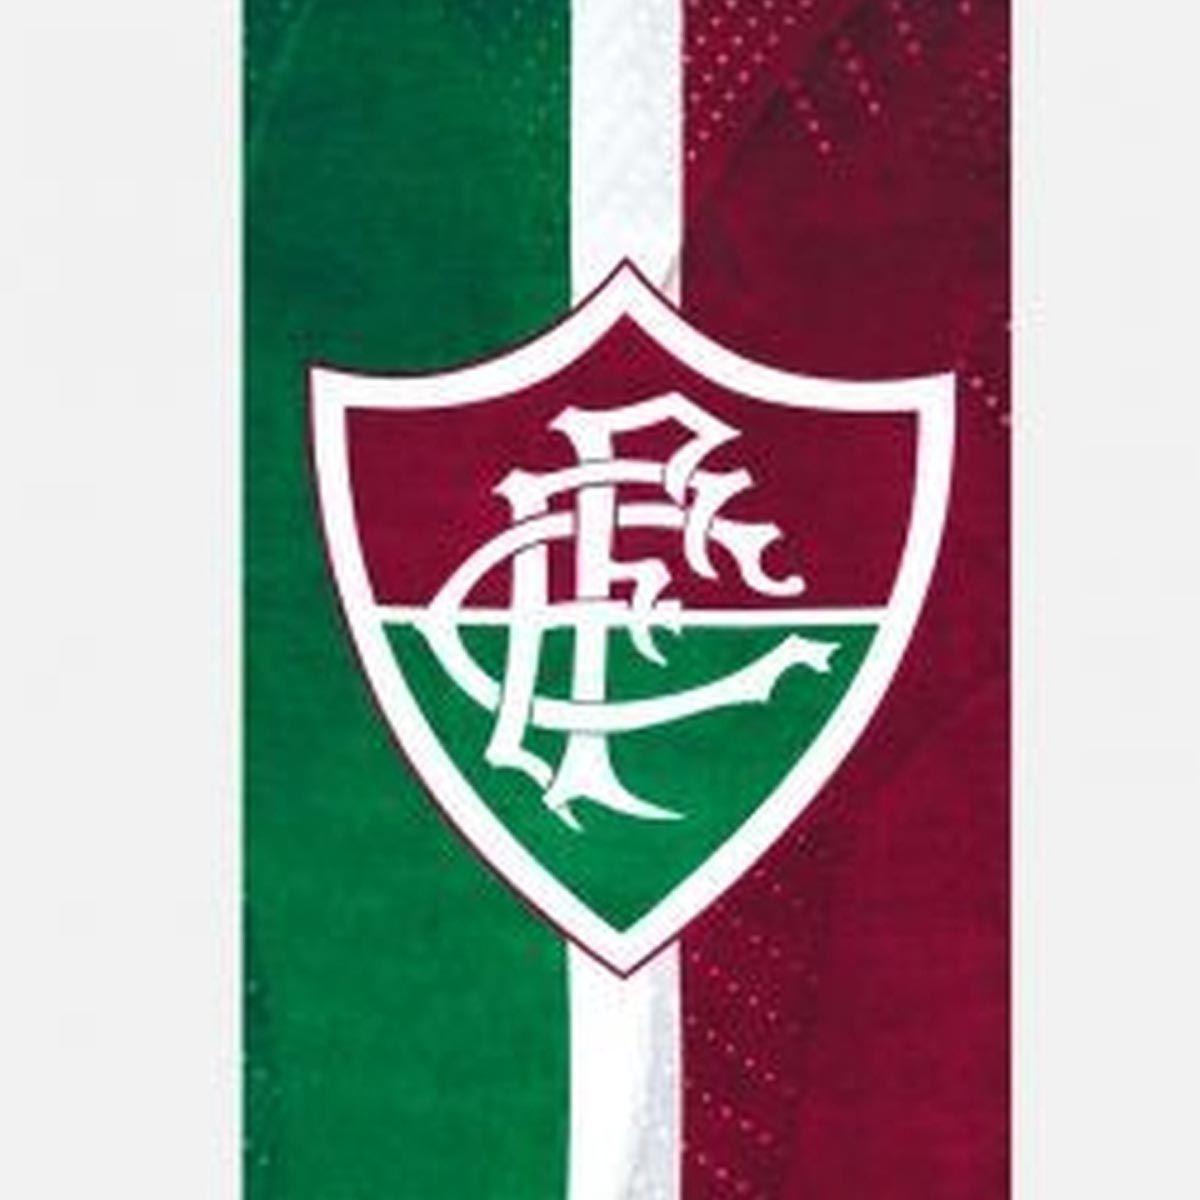 Toalha Time Velour 76x1.52 Fluminense 07